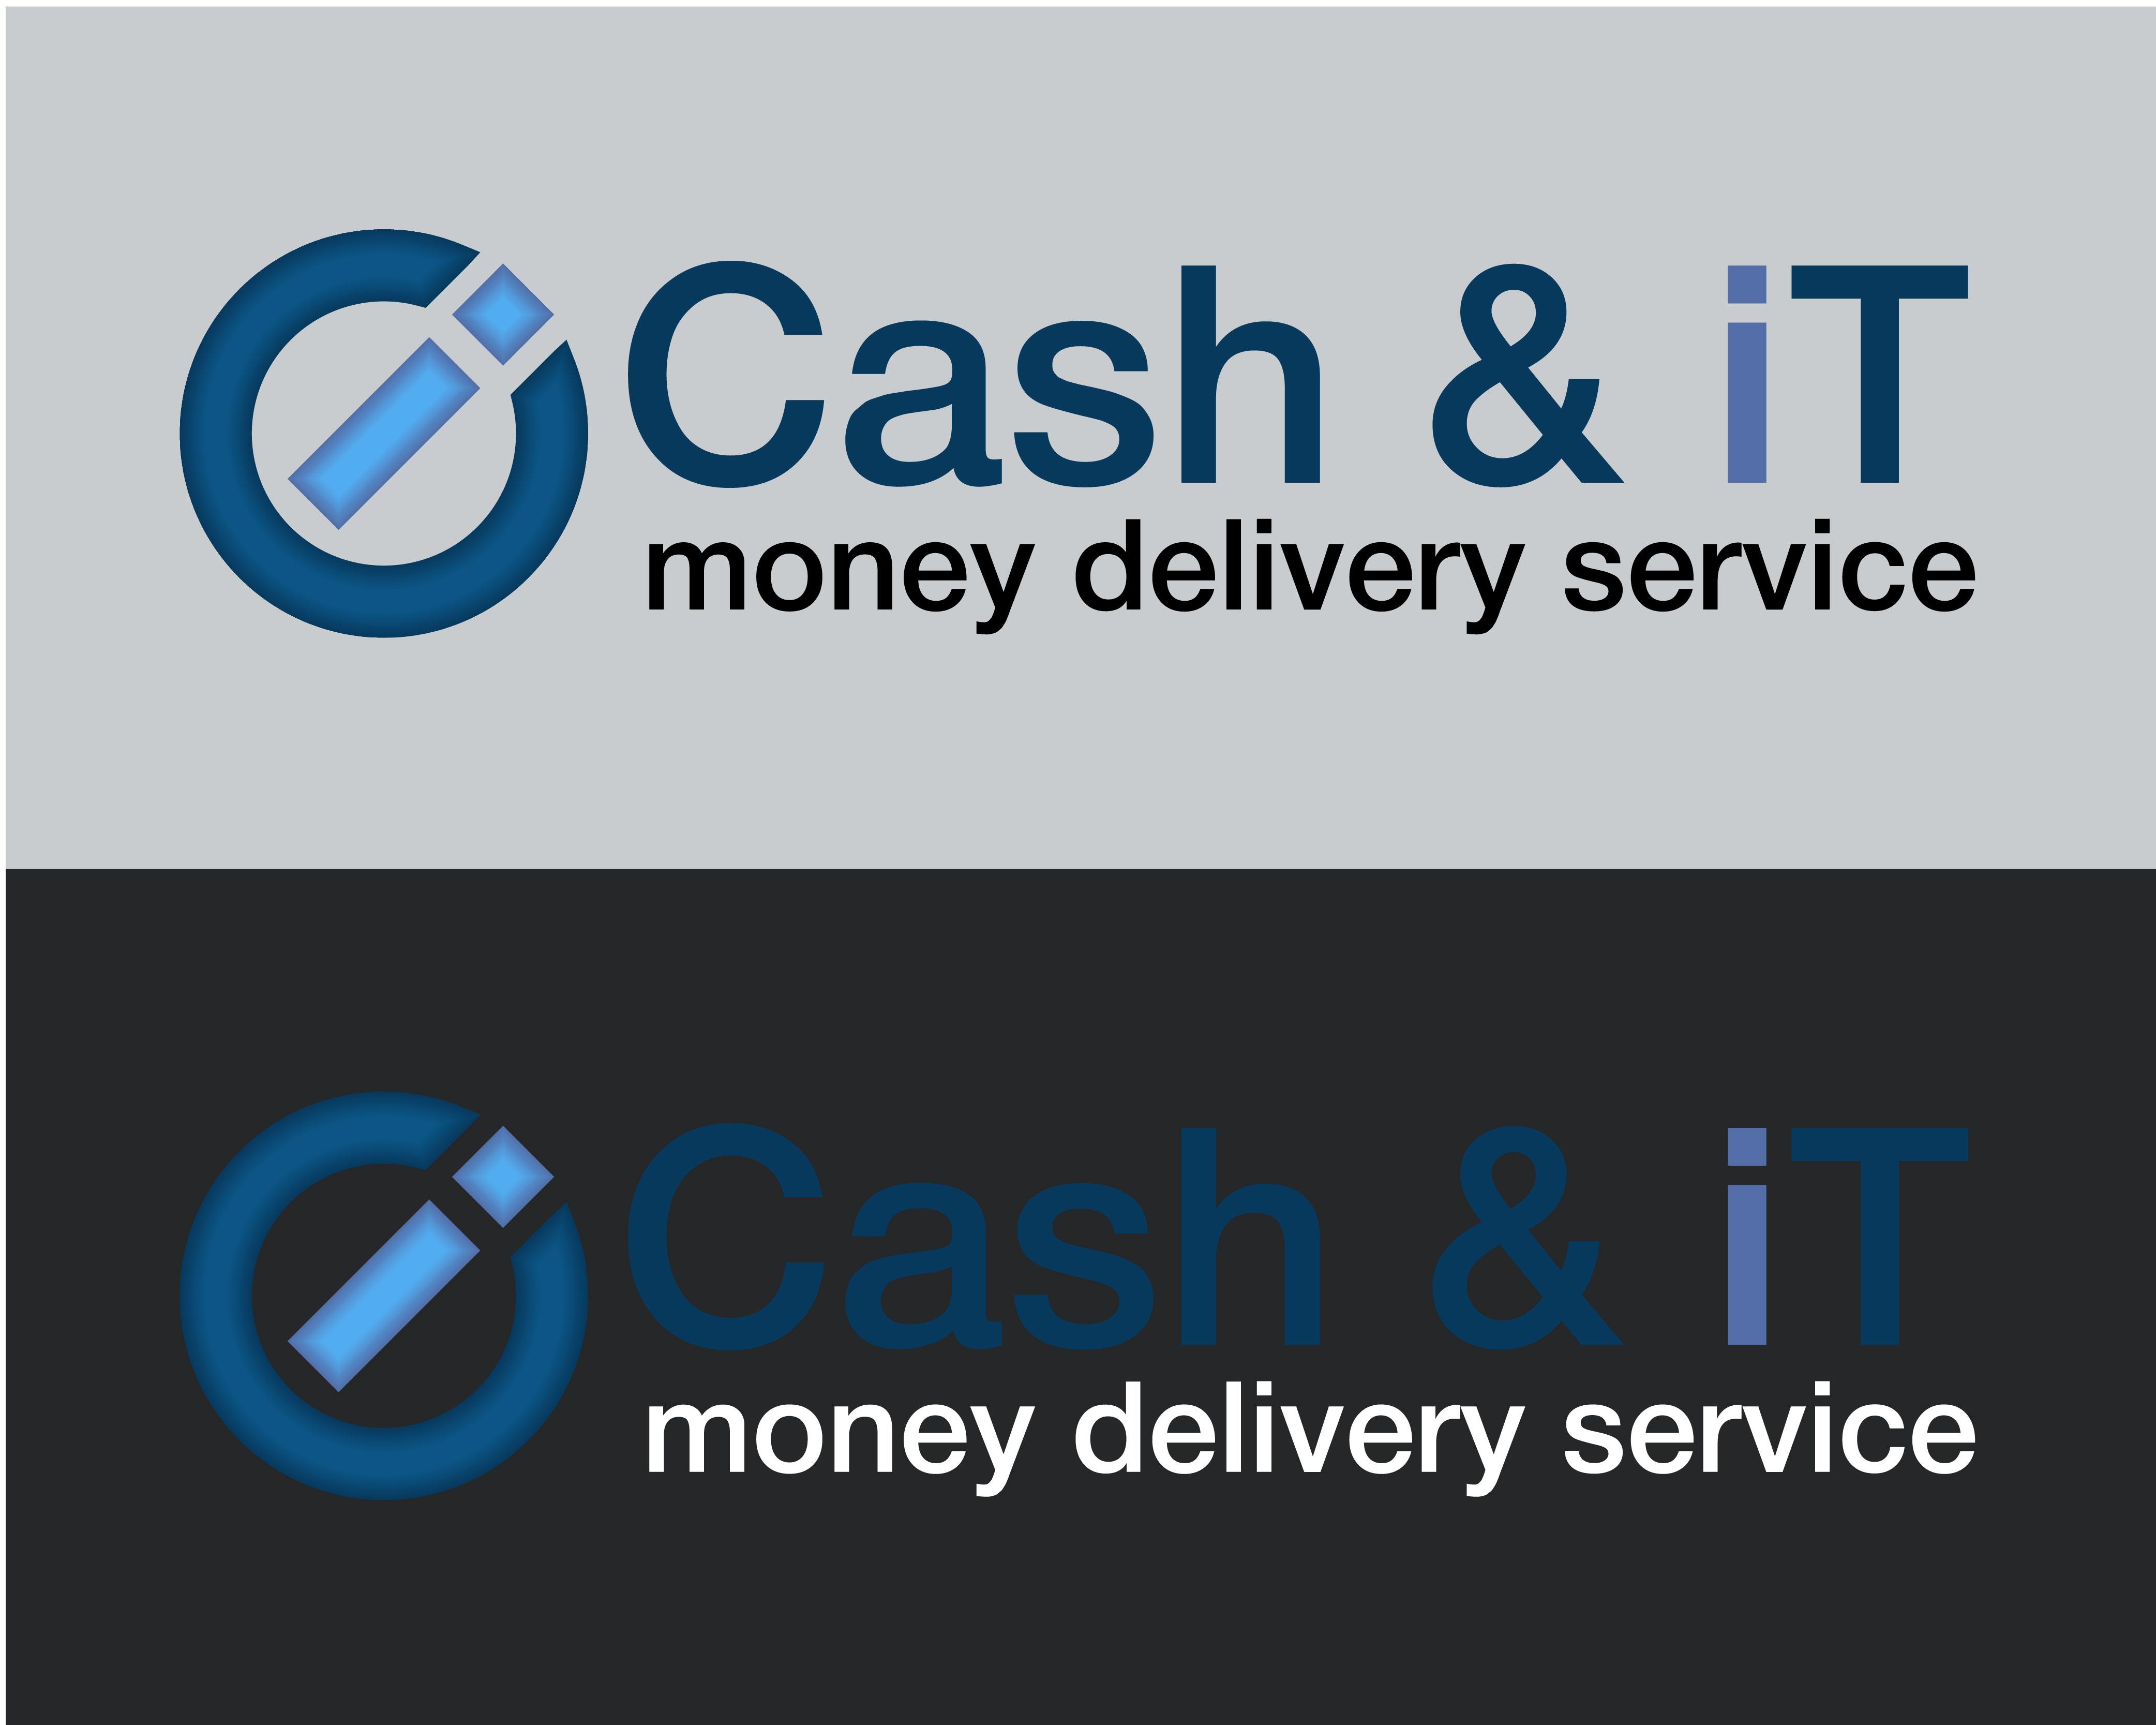 Логотип для Cash & IT - сервис доставки денег фото f_2065fdb504010ea7.jpg